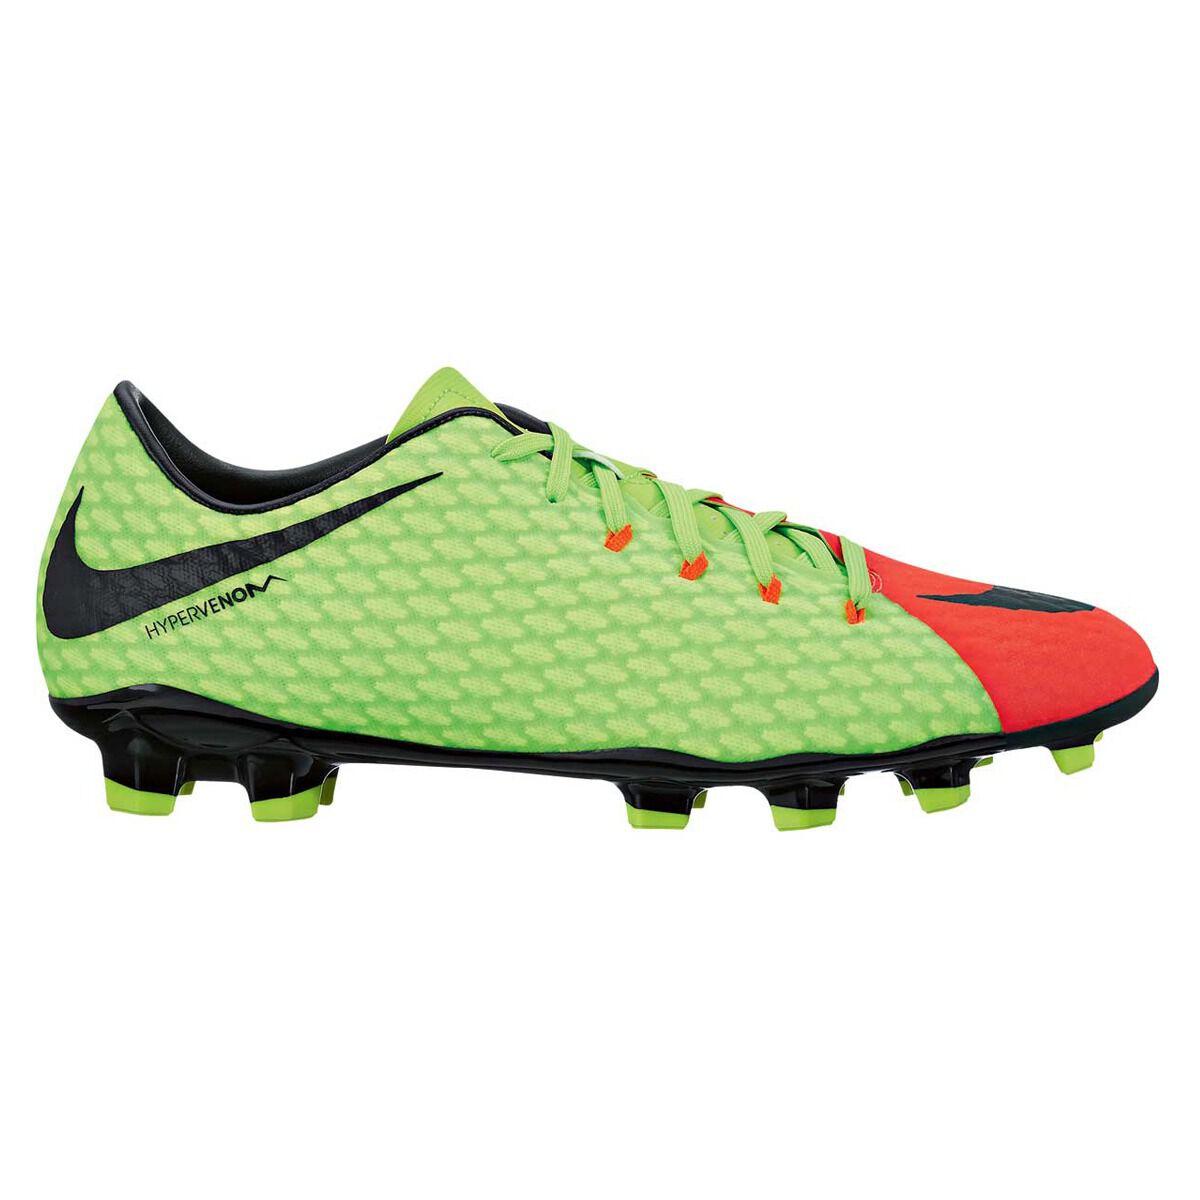 nike green hypervenom football boots